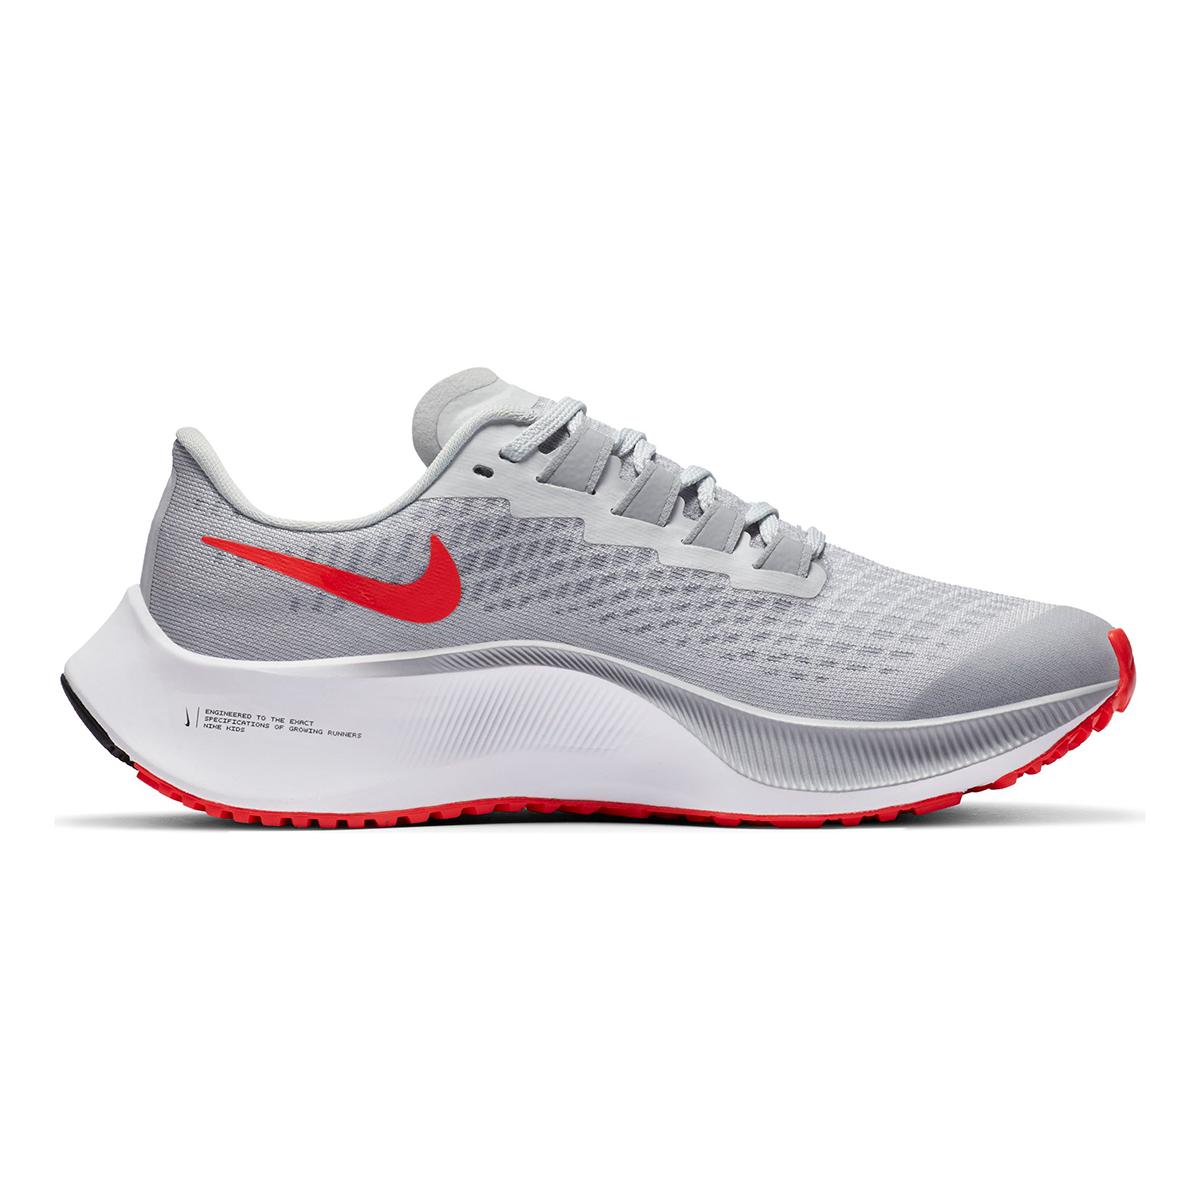 Kid's Nike Air Zoom Pegasus 37 Running Shoe - Color: Pure Platinum/Wolf Grey/Bright Crimson/Racer Blue - Size: 1 - Width: Regular, Pure Platinum/Wolf Grey/Bright Crimson/Racer Blue, large, image 2